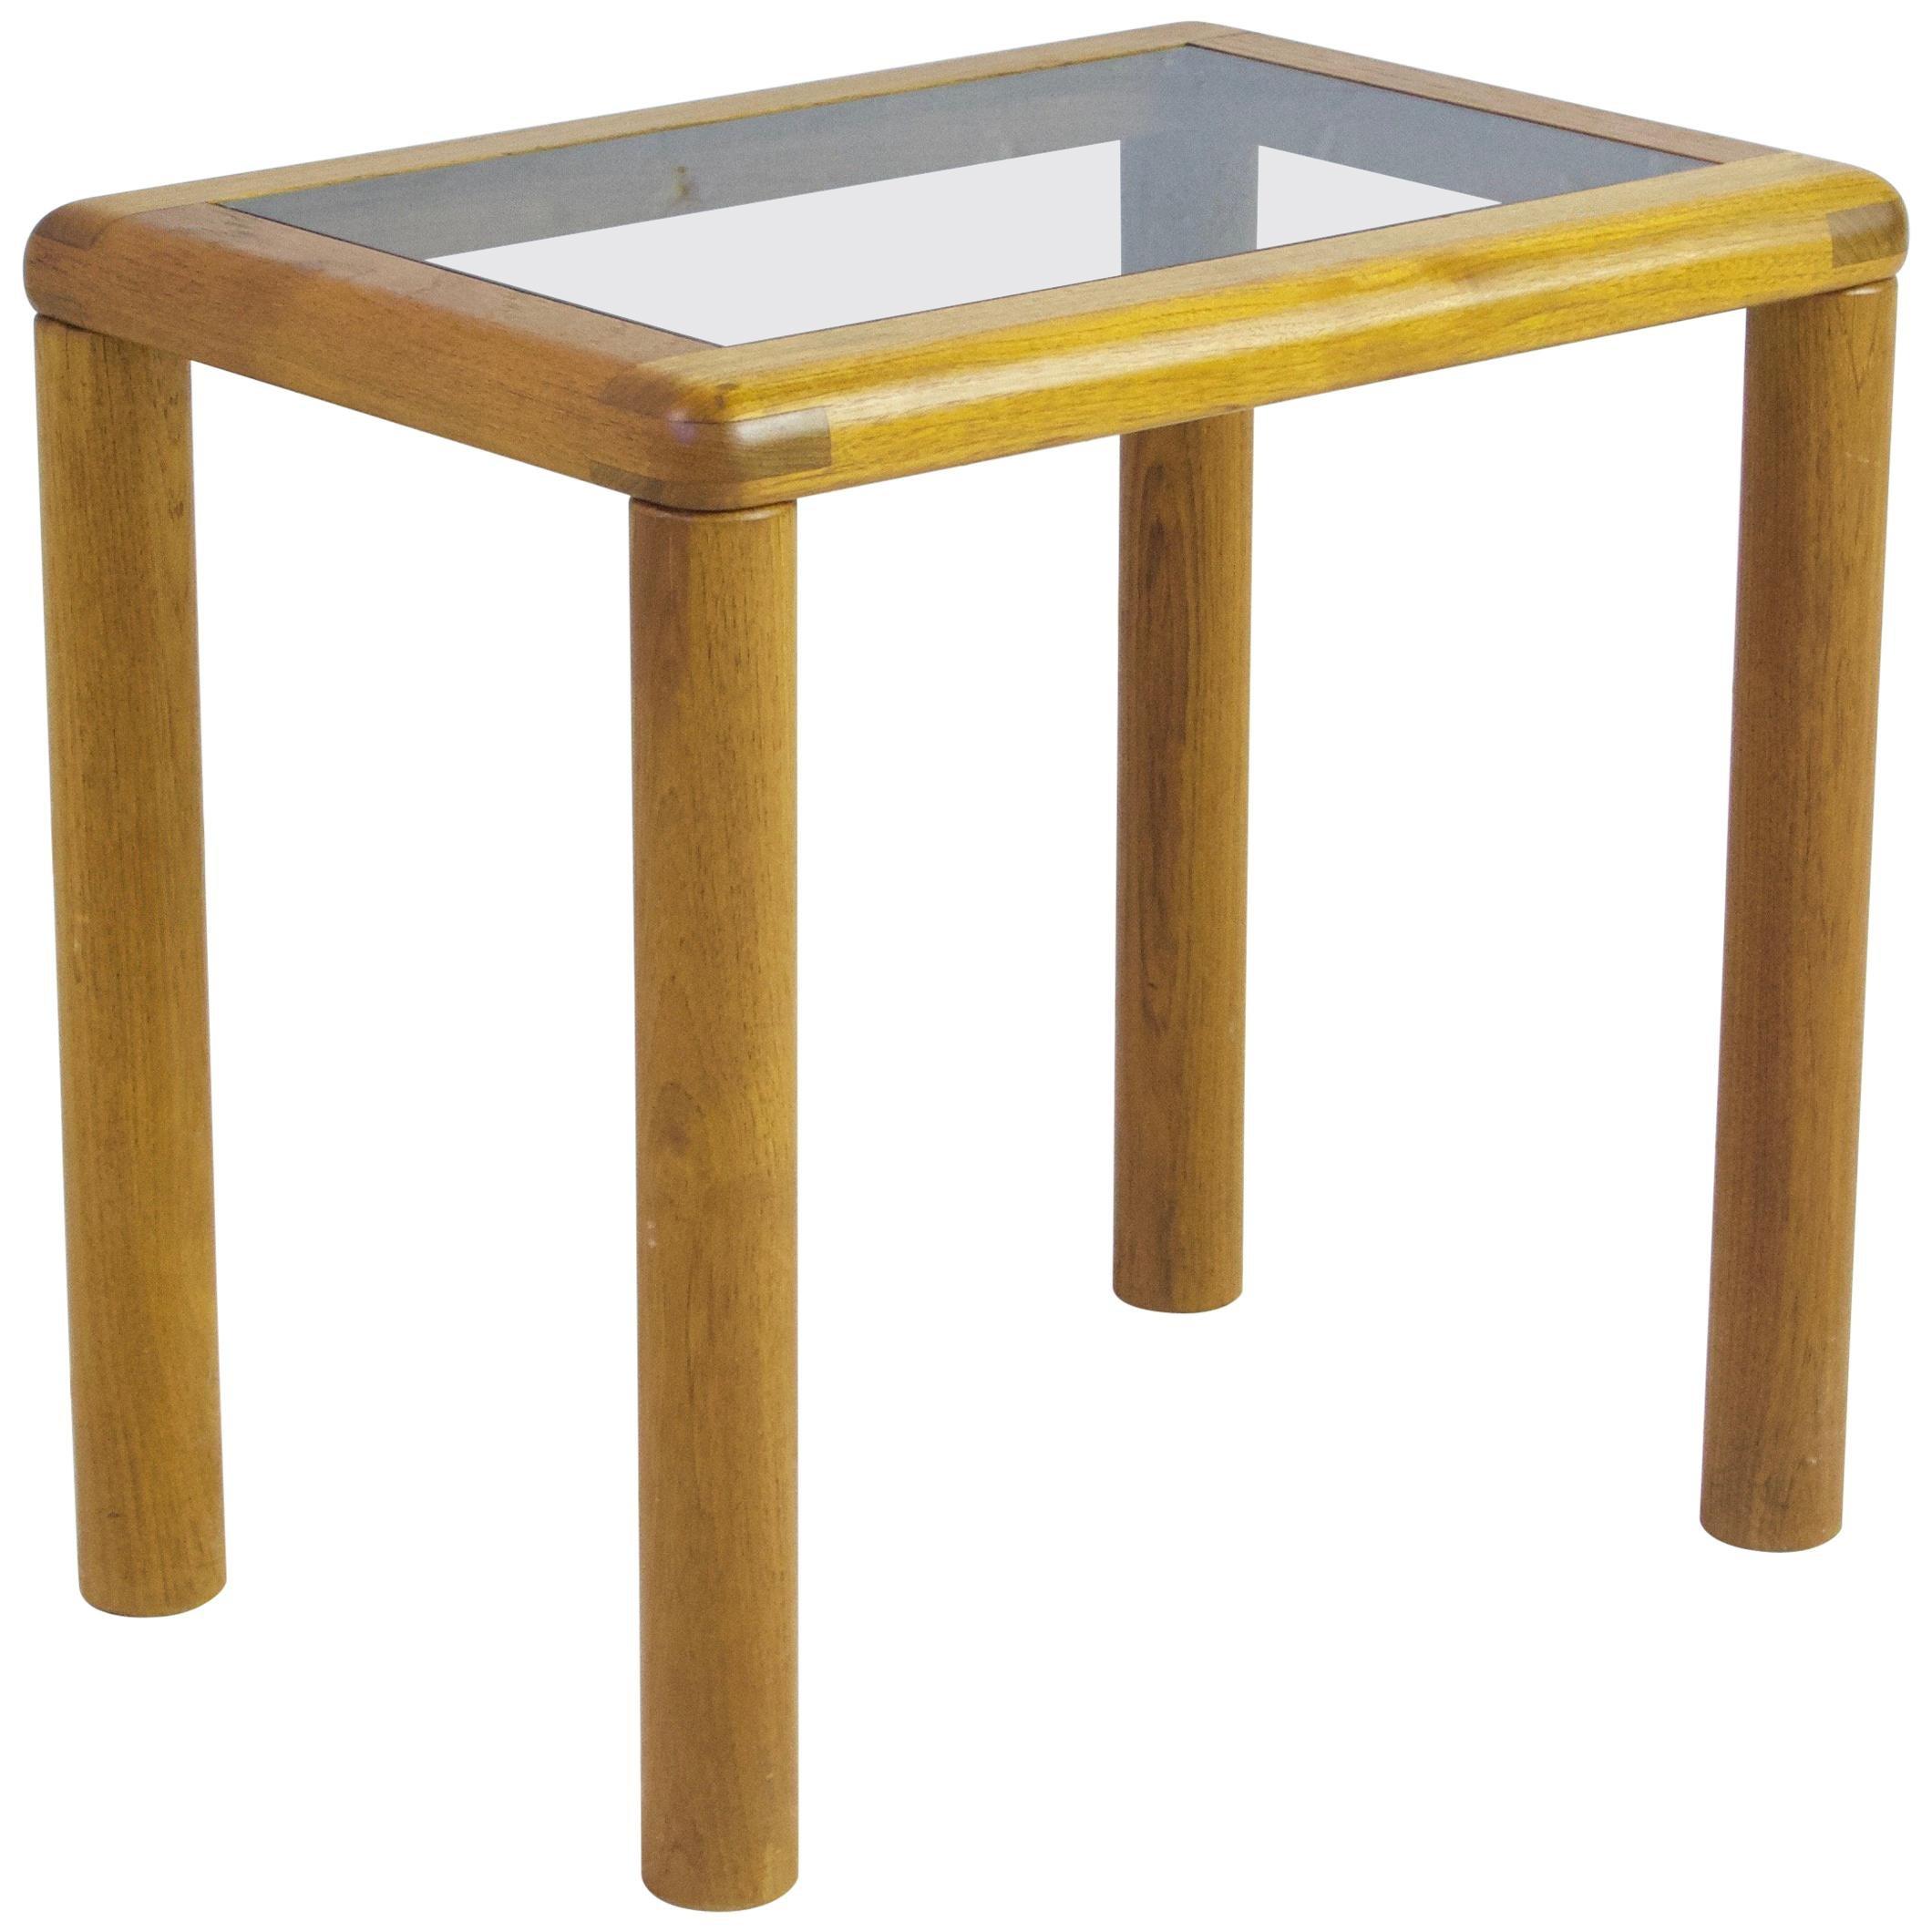 Vintage Danish Side Table in Teak with Turned Legs, 1960s